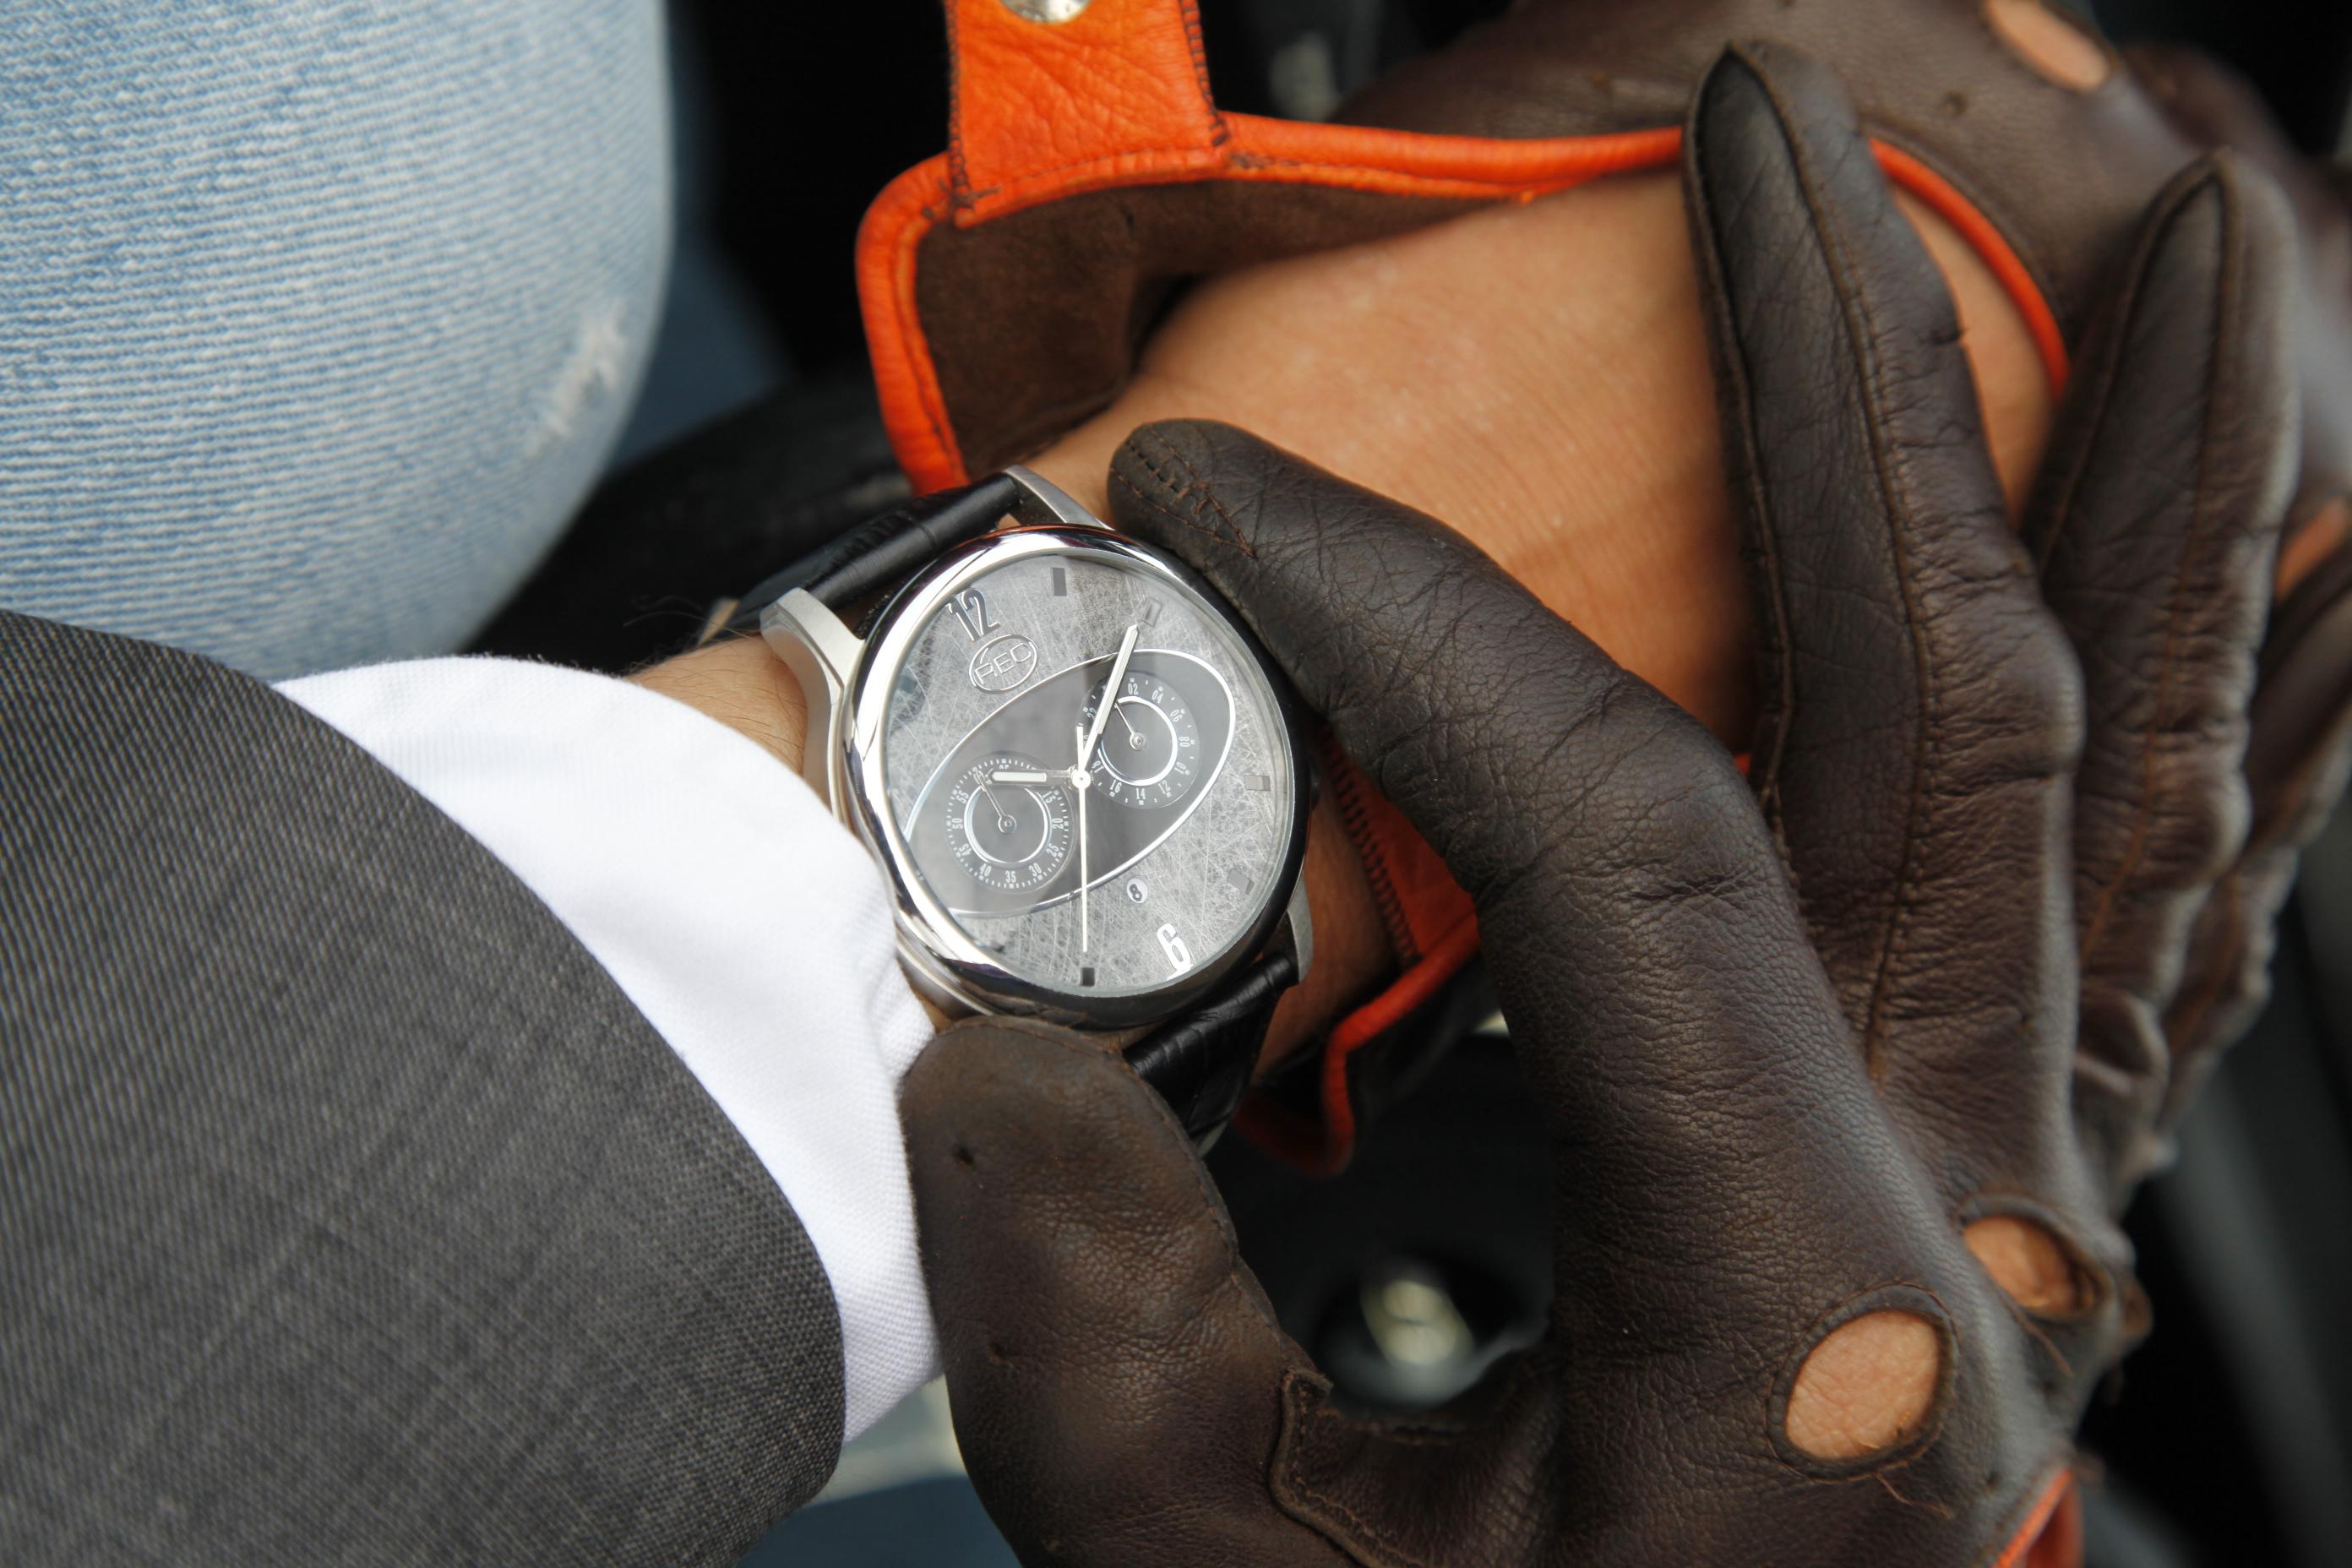 REC watches